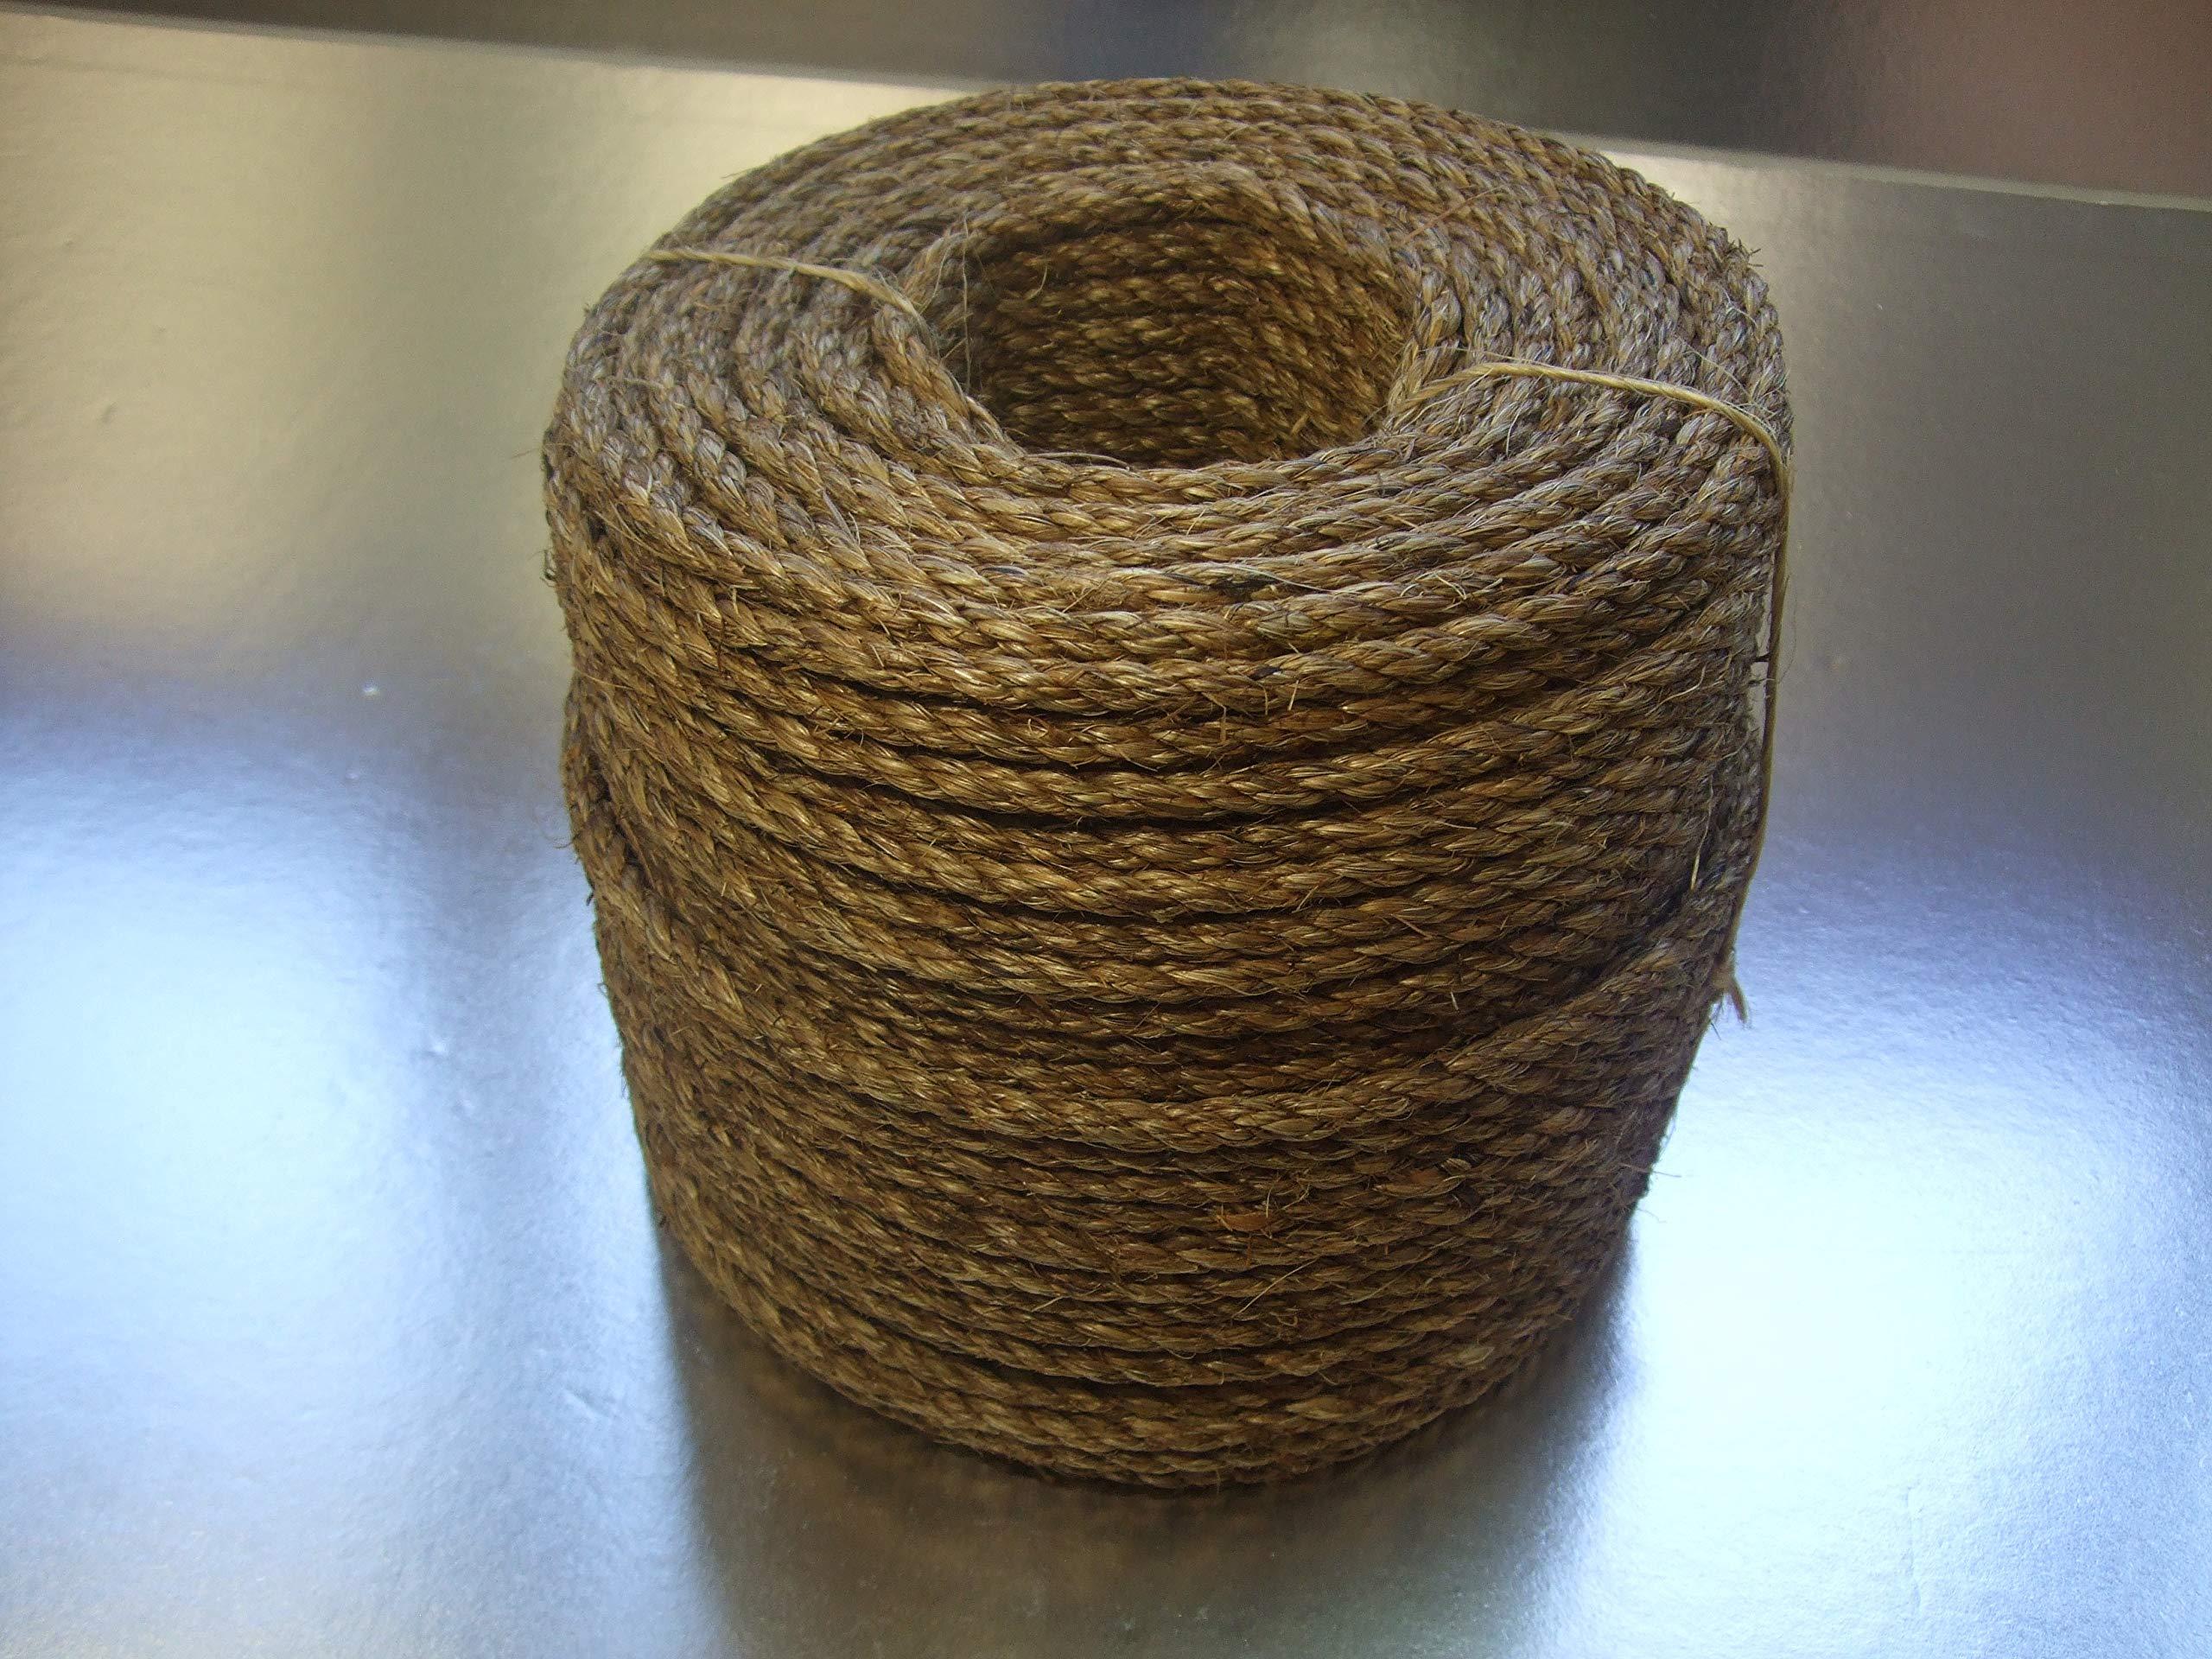 Manila Hemp Rope 3/8'' x 100' Coil Great White